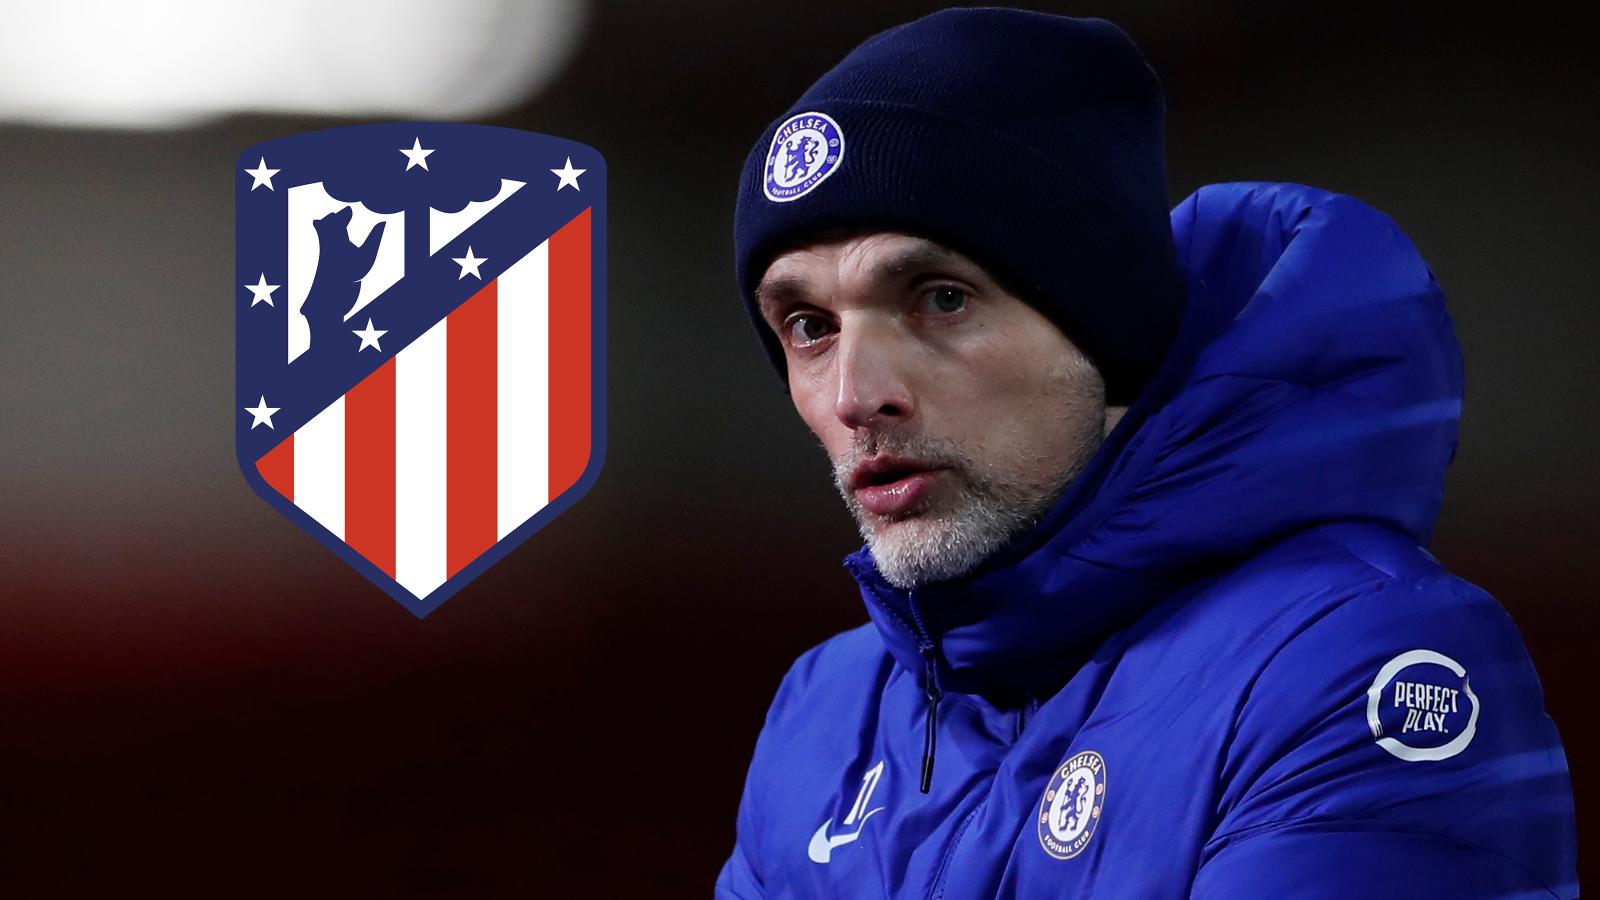 Tuchel admits Chelsea have Champions League edge after Atletico Madrid lose home advantage